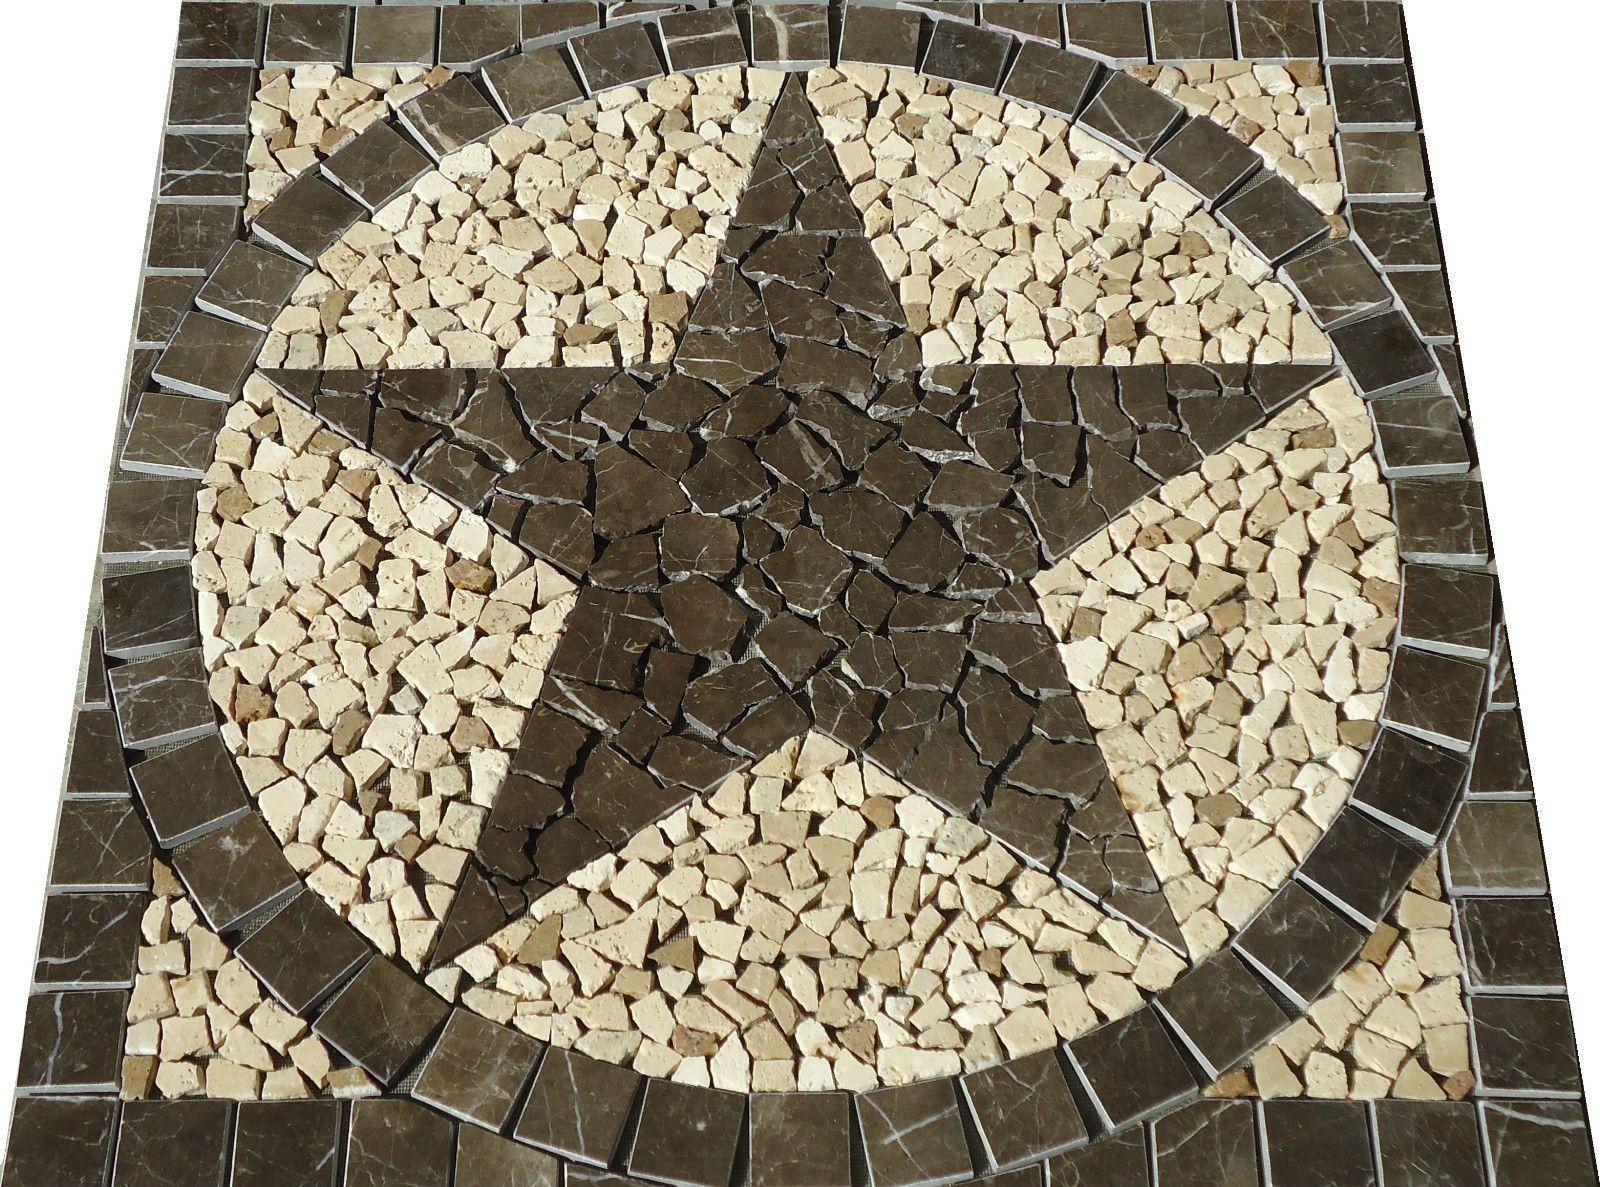 30 Sq Texas Star Mosaic Marble Medallion Tile Floor Wall Backsplash Pattern Art Ebay